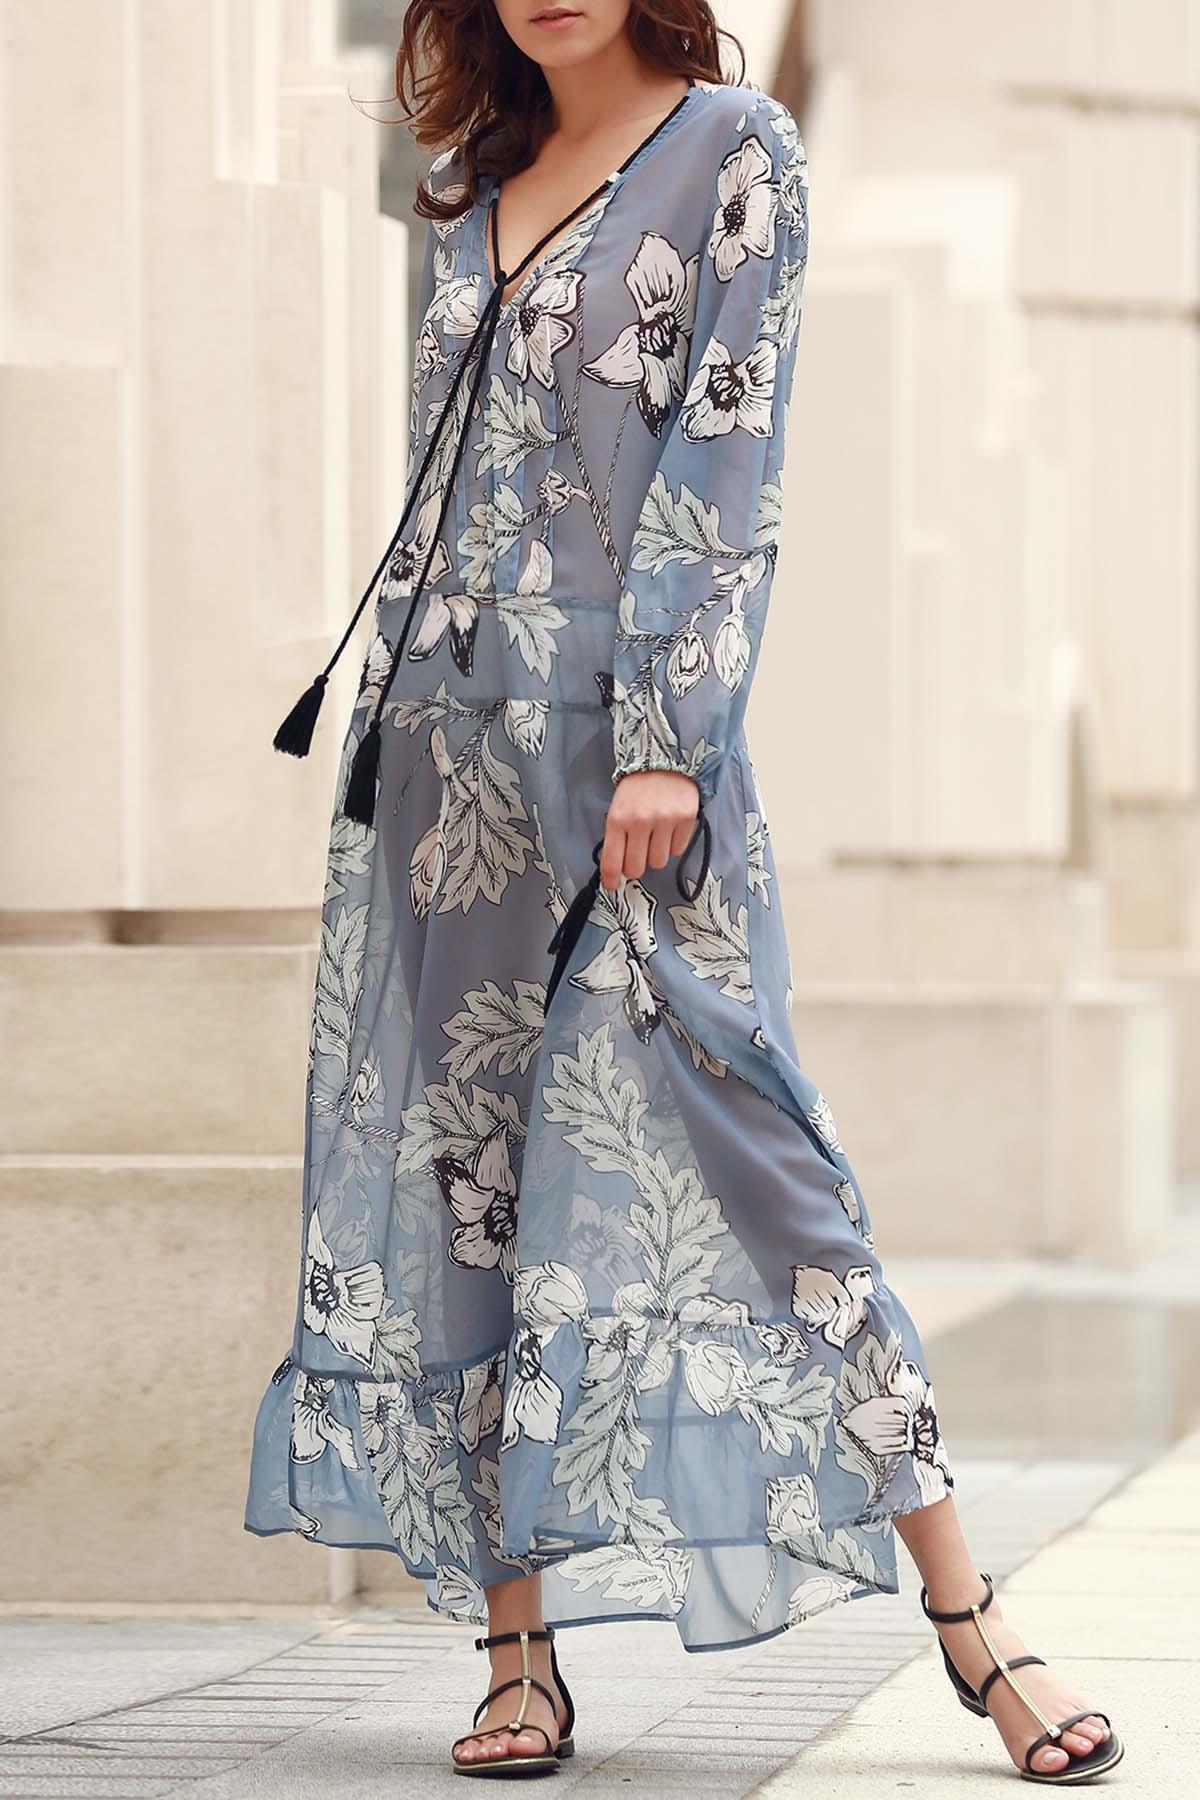 V-Neck Long Sleeve Floral Print Boho Dress